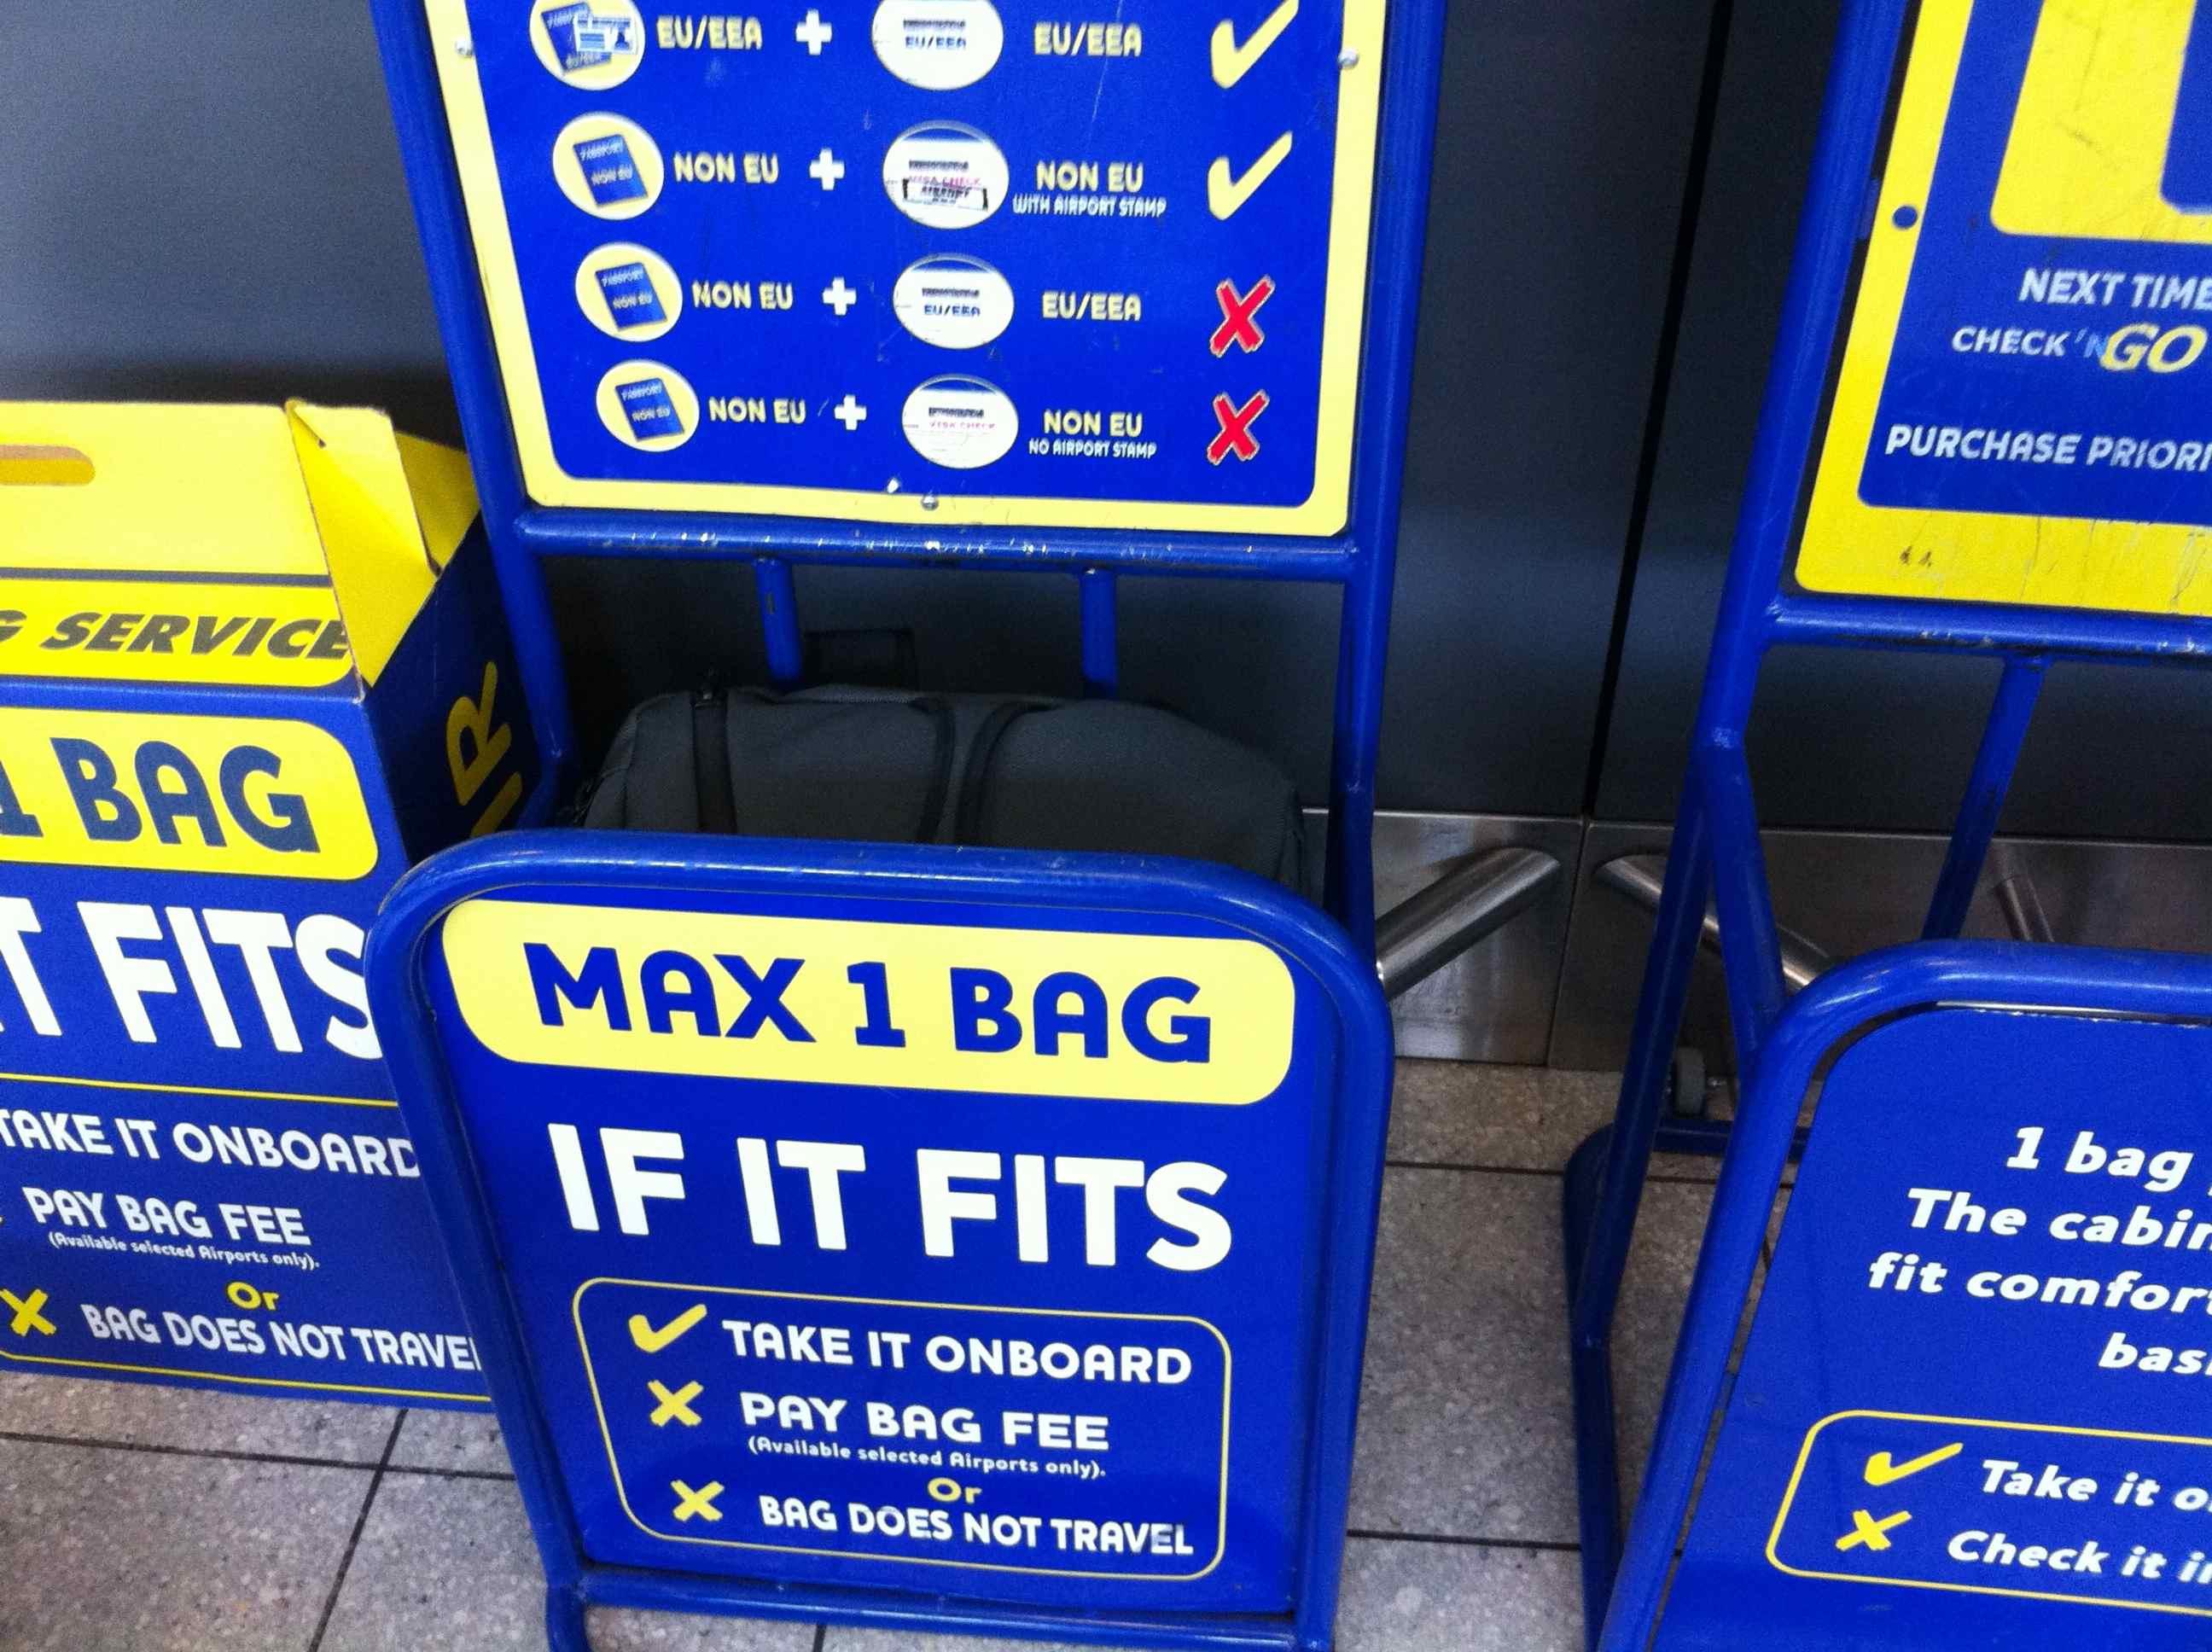 Ryanair bag tester